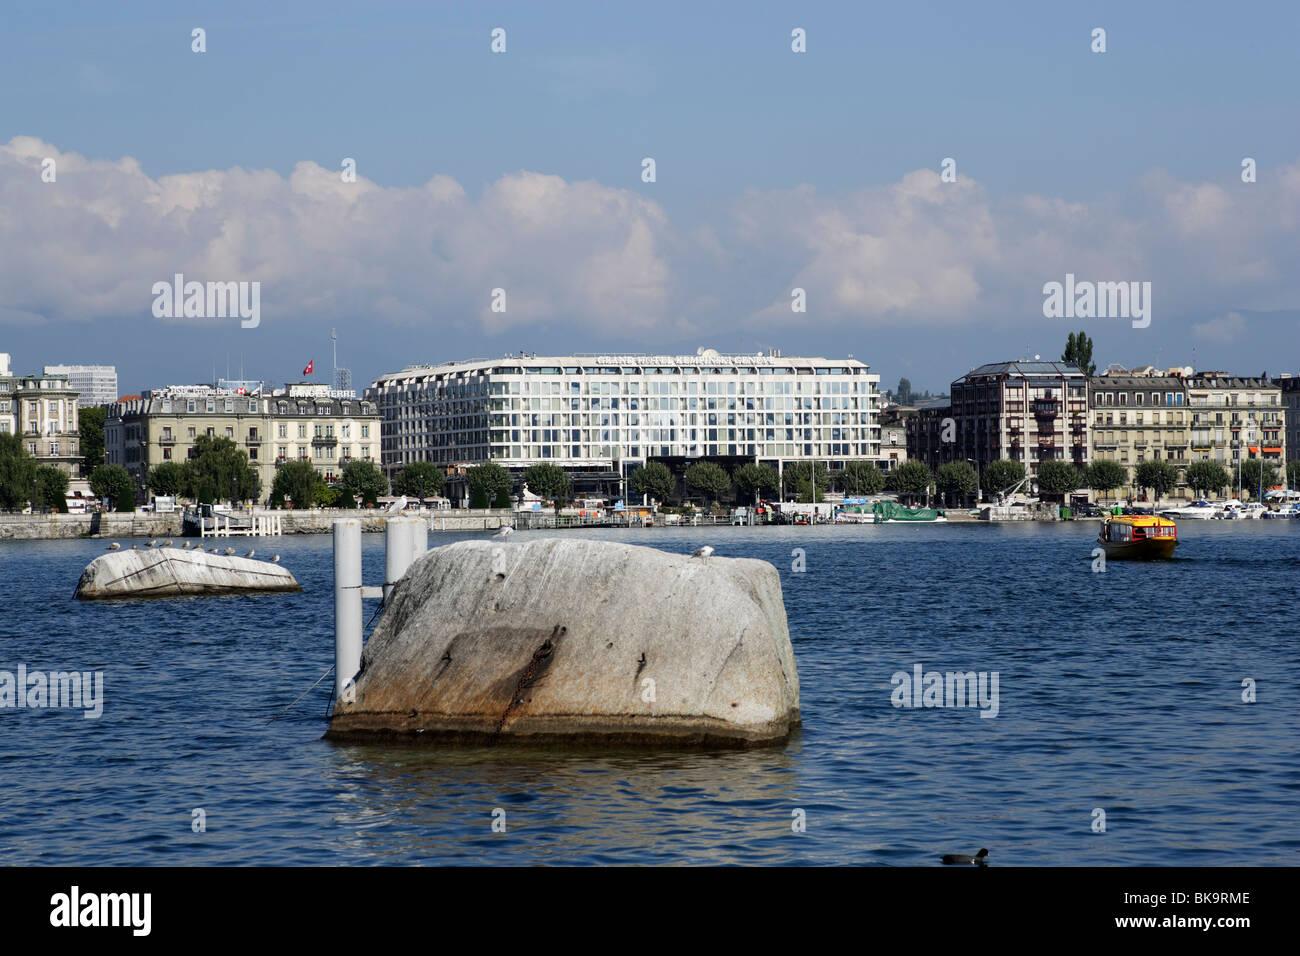 Repere Pierre du Niton in lake Geneva, Geneva, Canton of Geneva, Switzerland - Stock Image